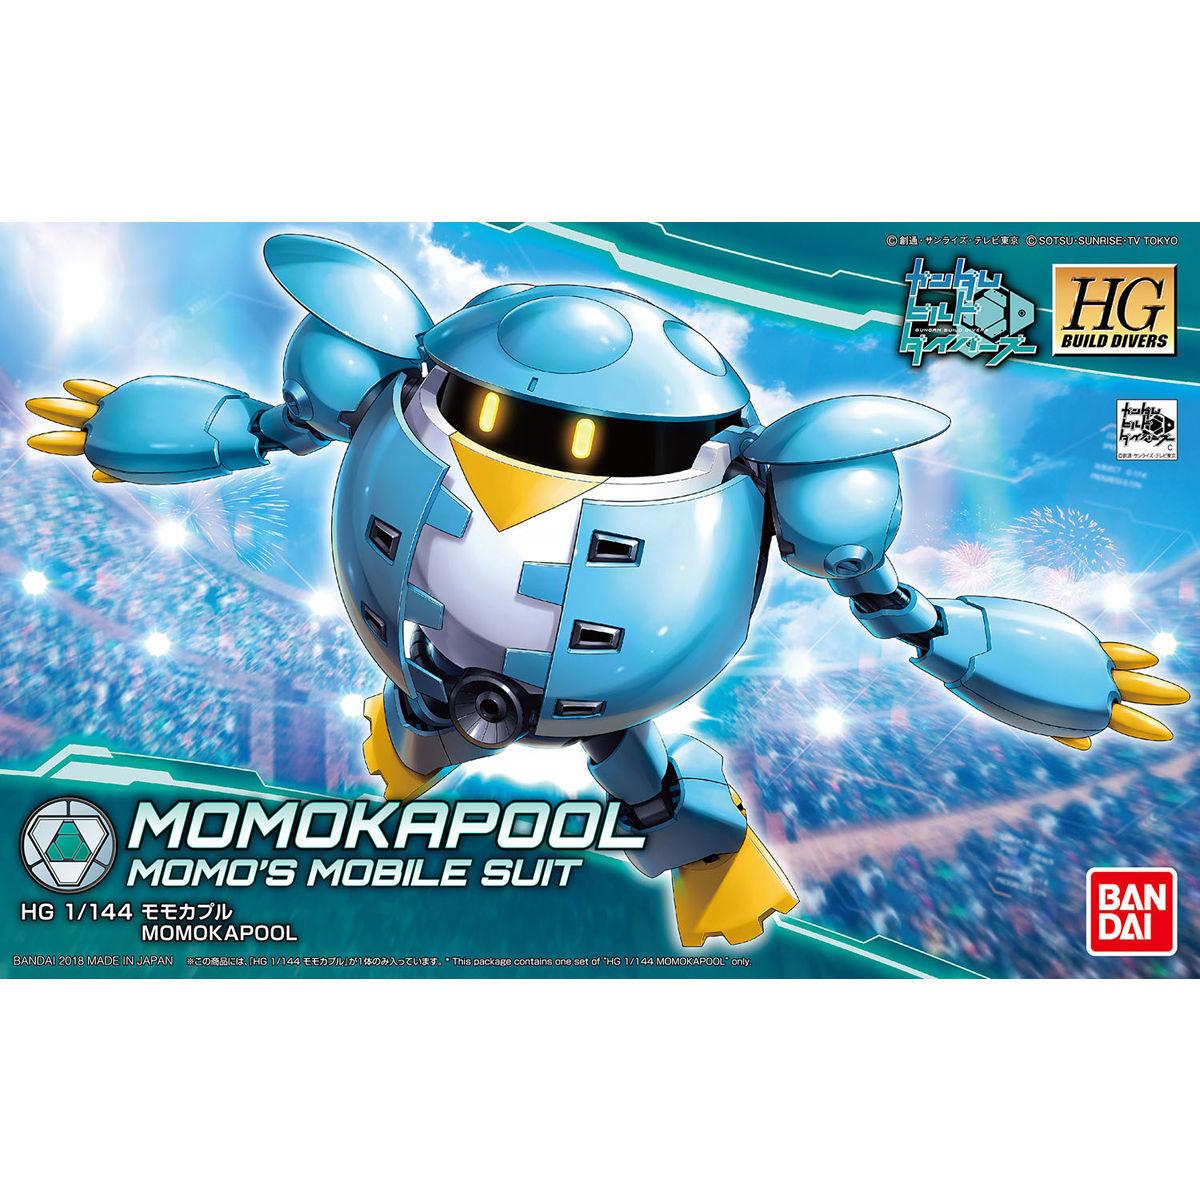 HGBD 1/144 Momokapool - Model kit image